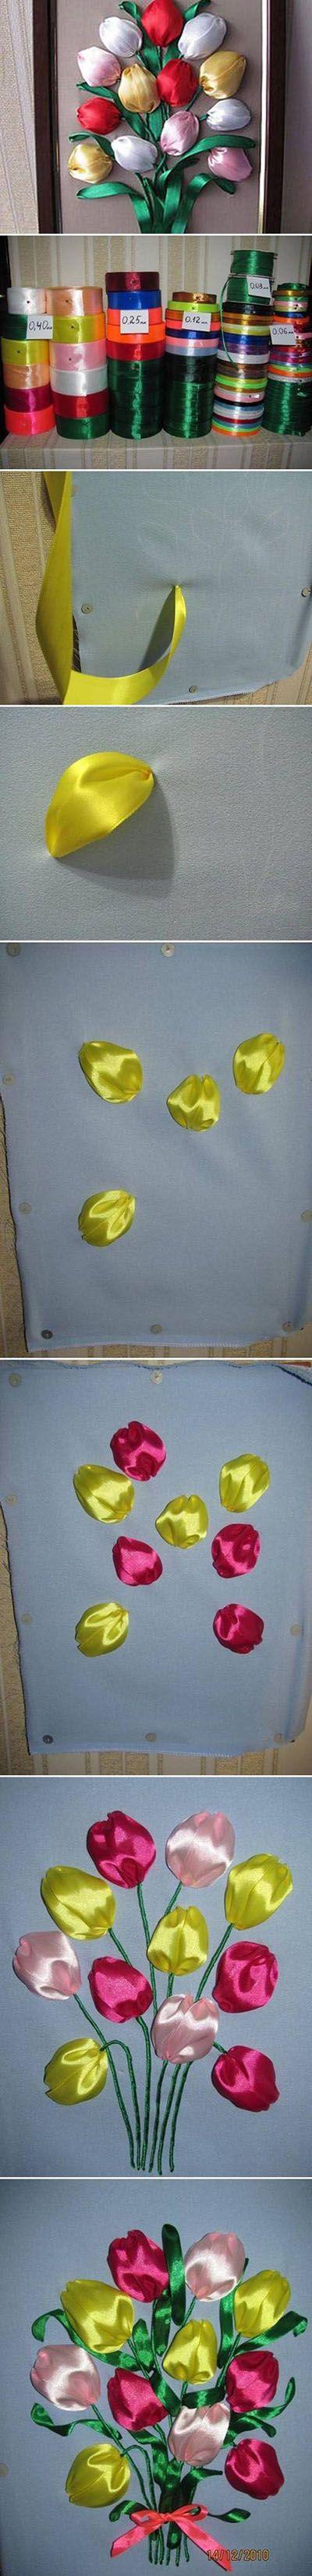 DIY Beautiful Flower Decoration beautiful diy crafts do it yourself diy projects crafty flower decoration